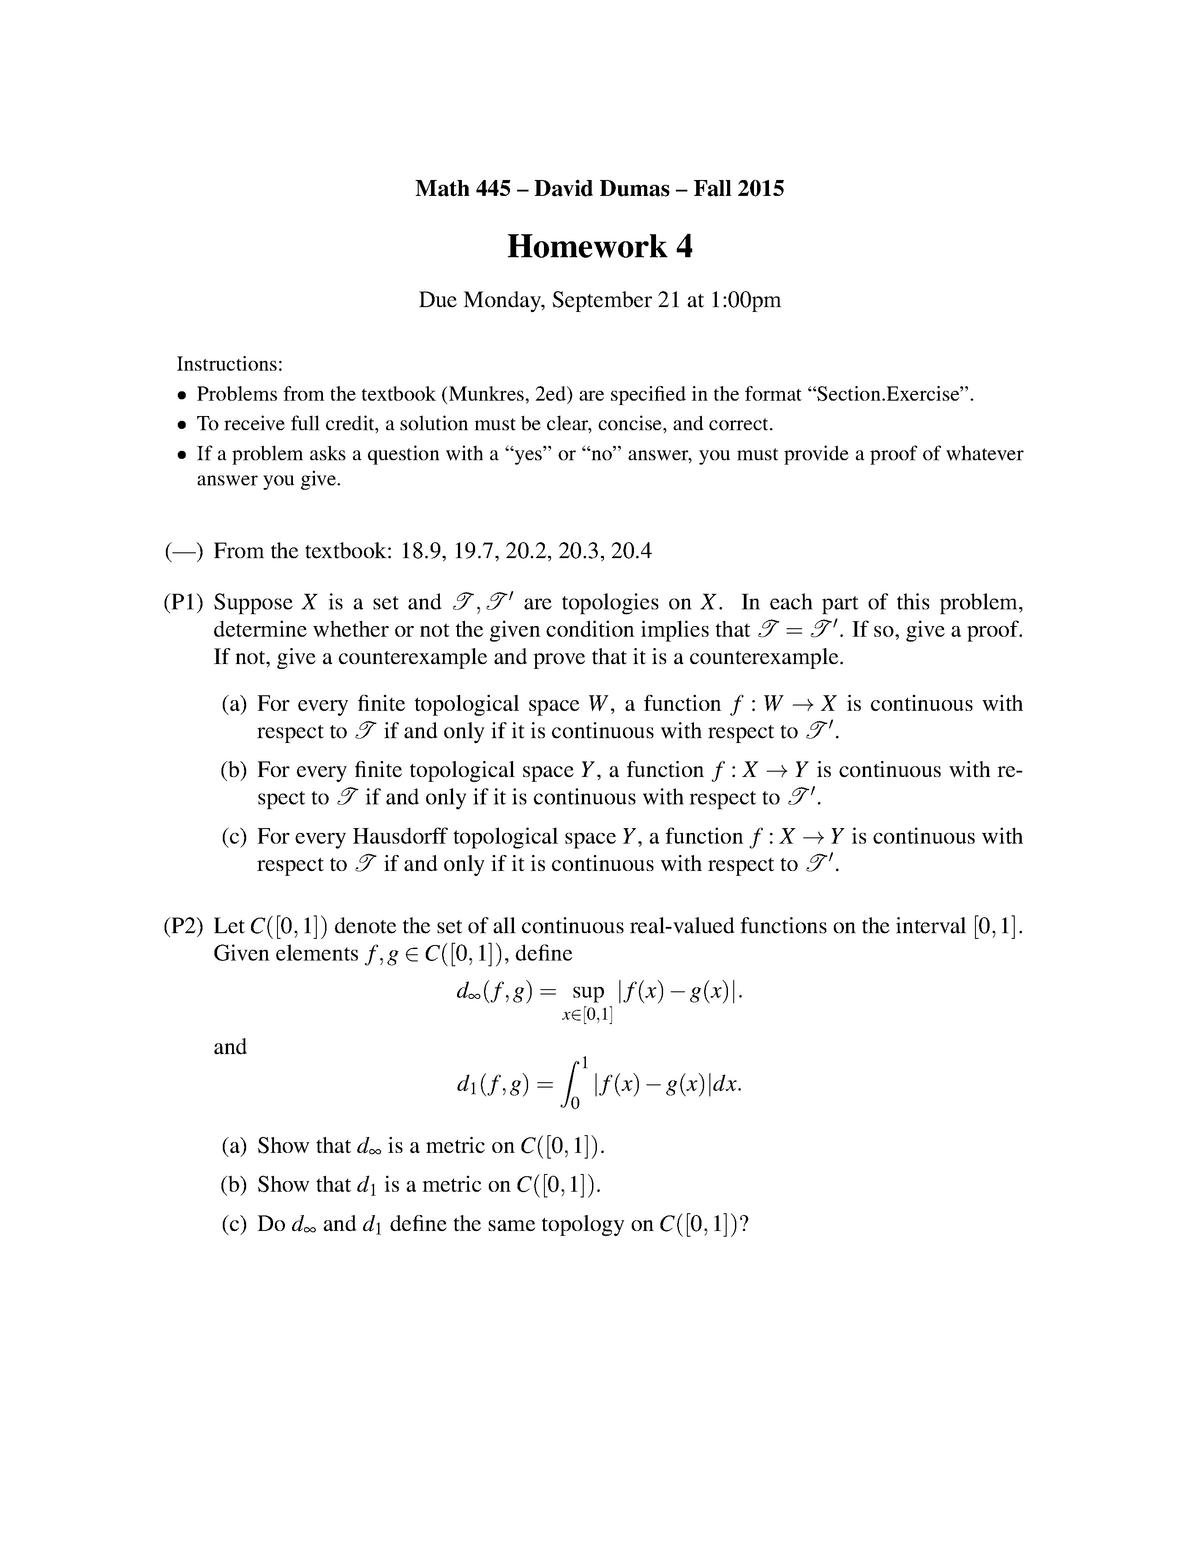 Math 445 - homework 4 - MATH 445 Introduction To Topology I